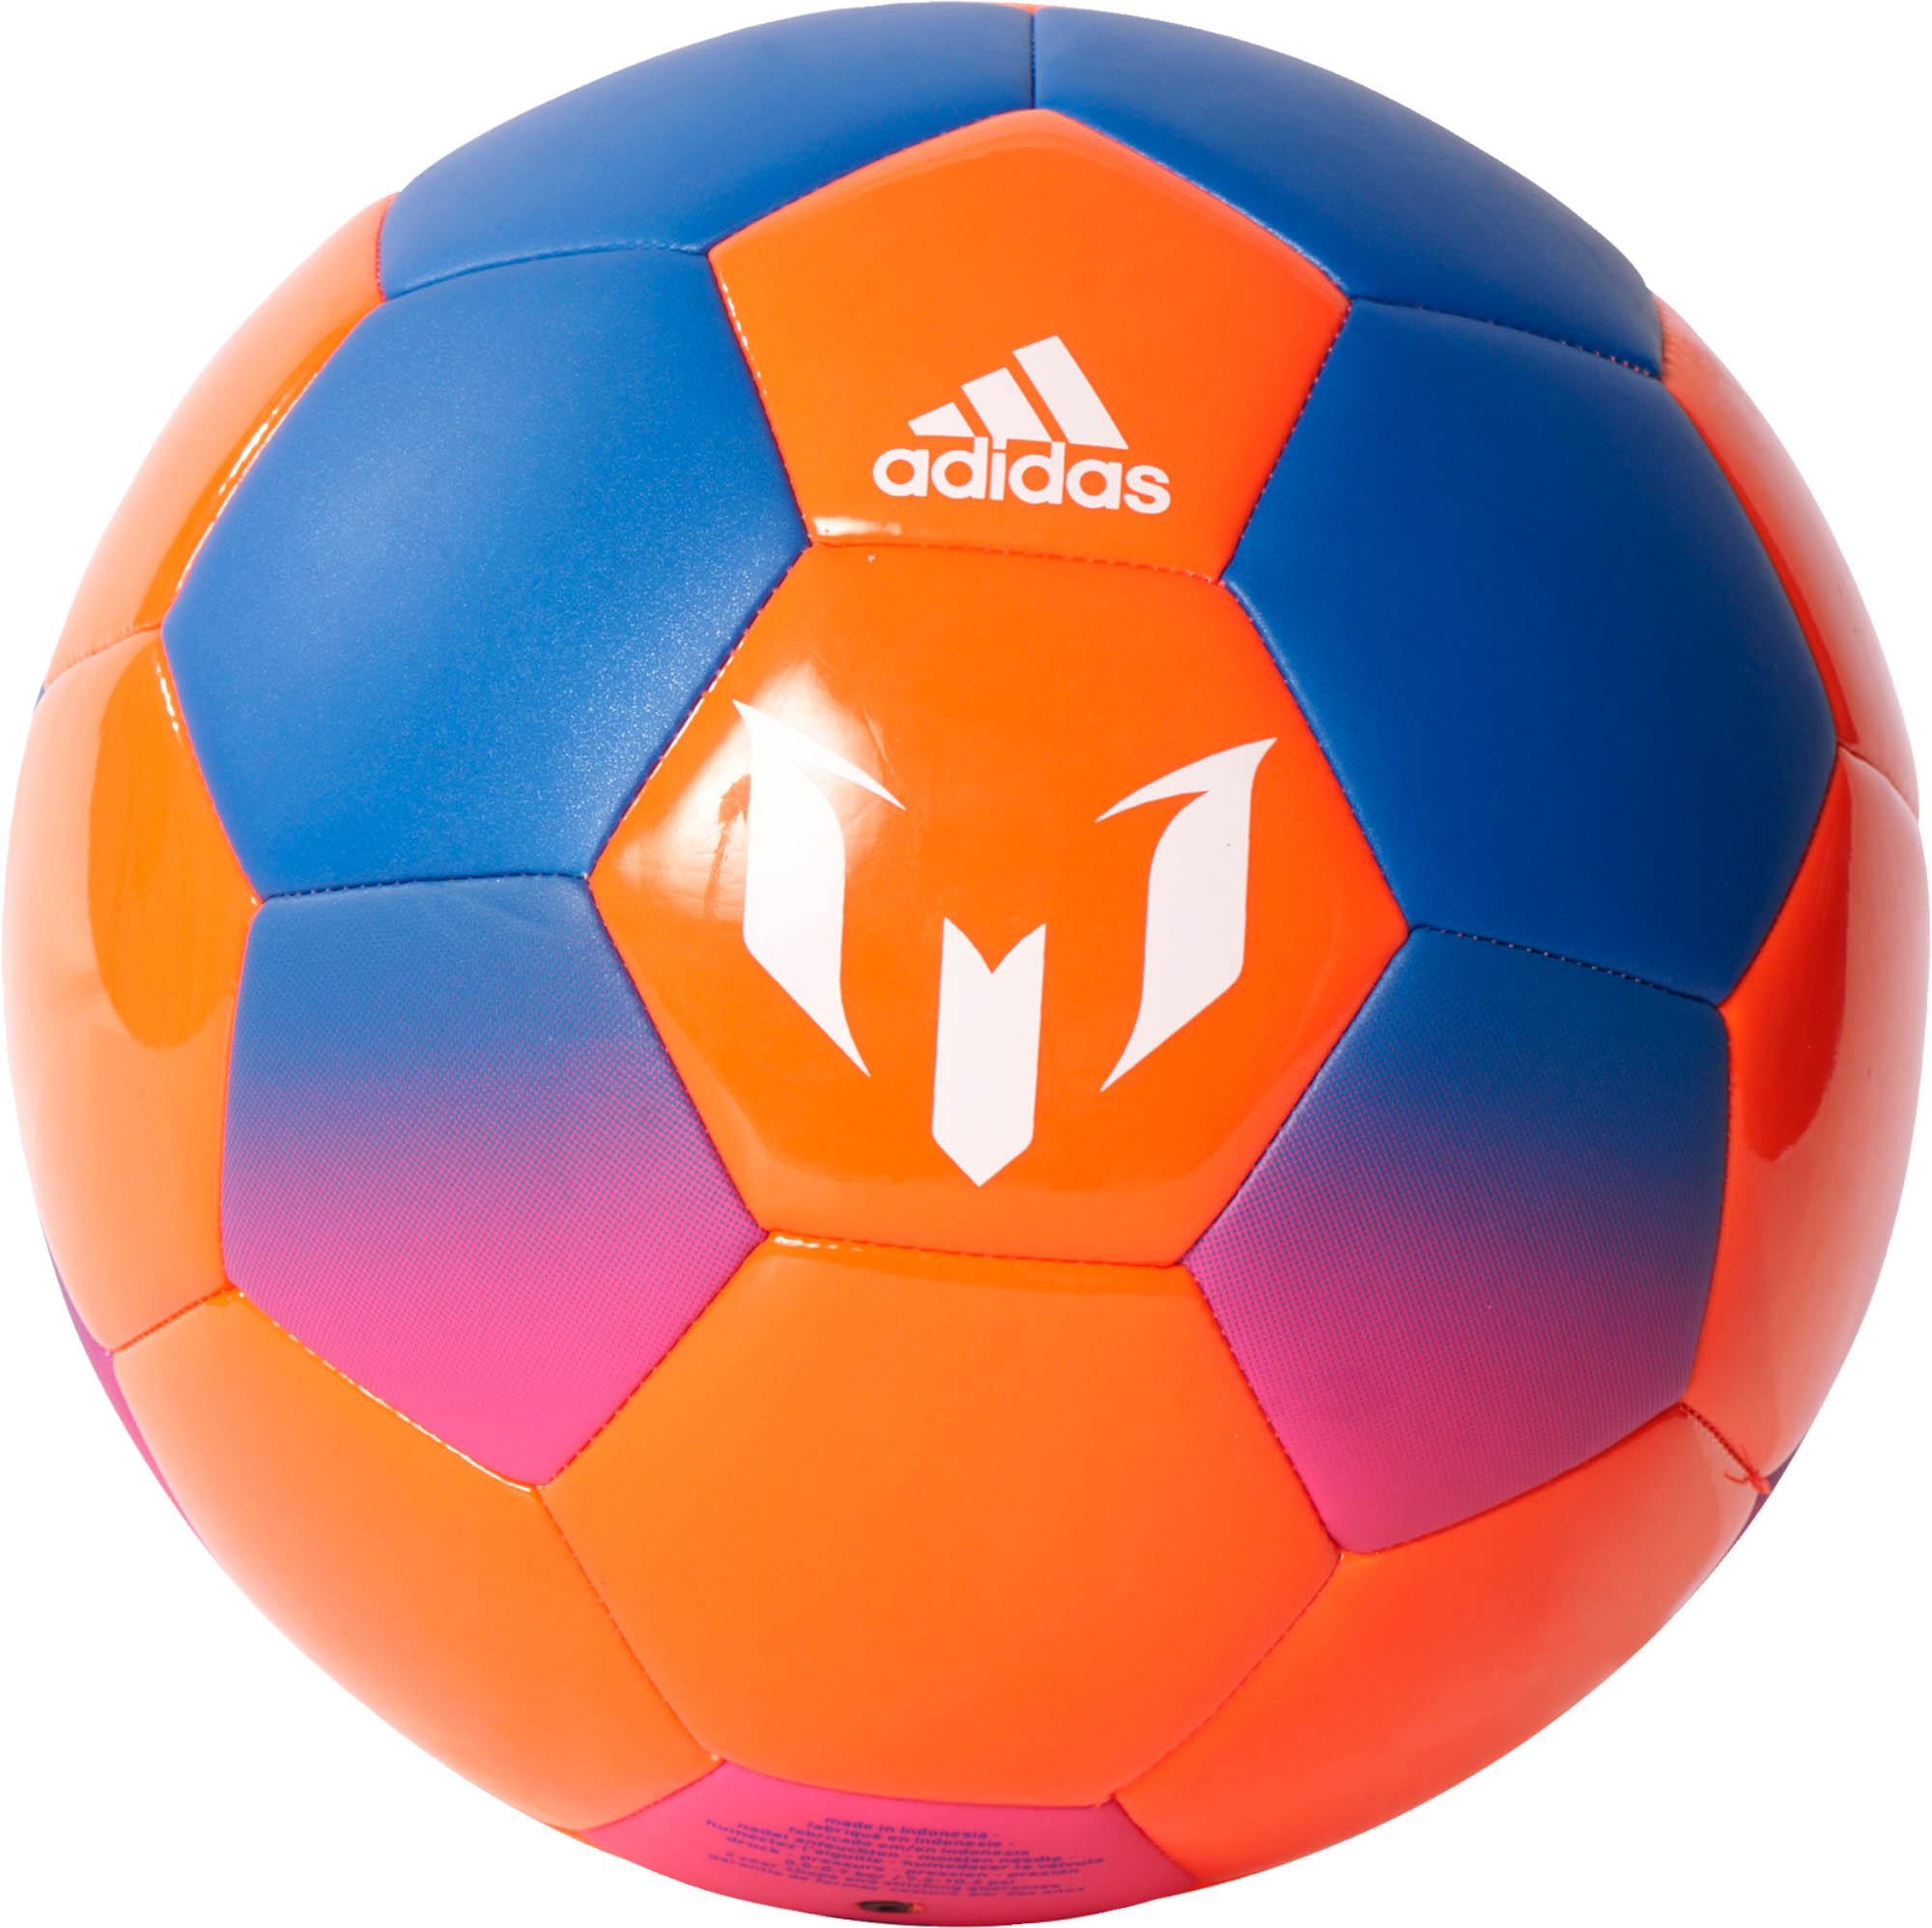 adidas messi soccer ball